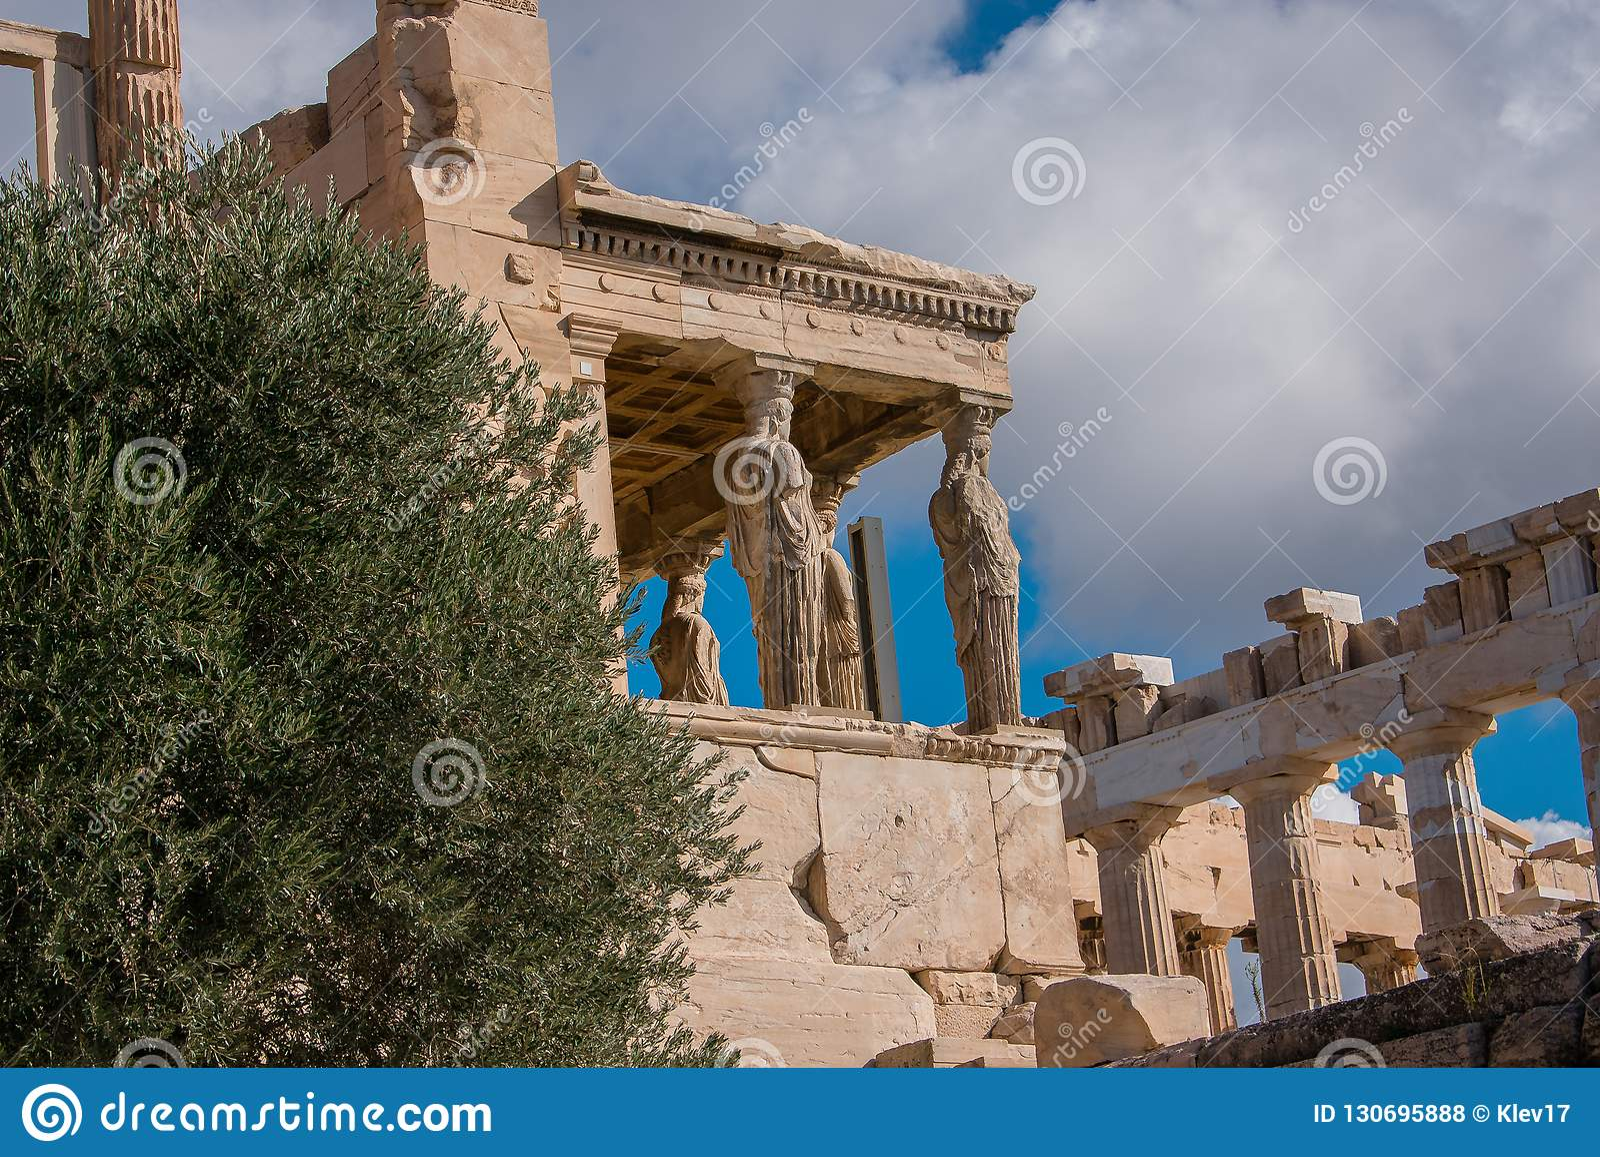 Caryatids of Acropolis